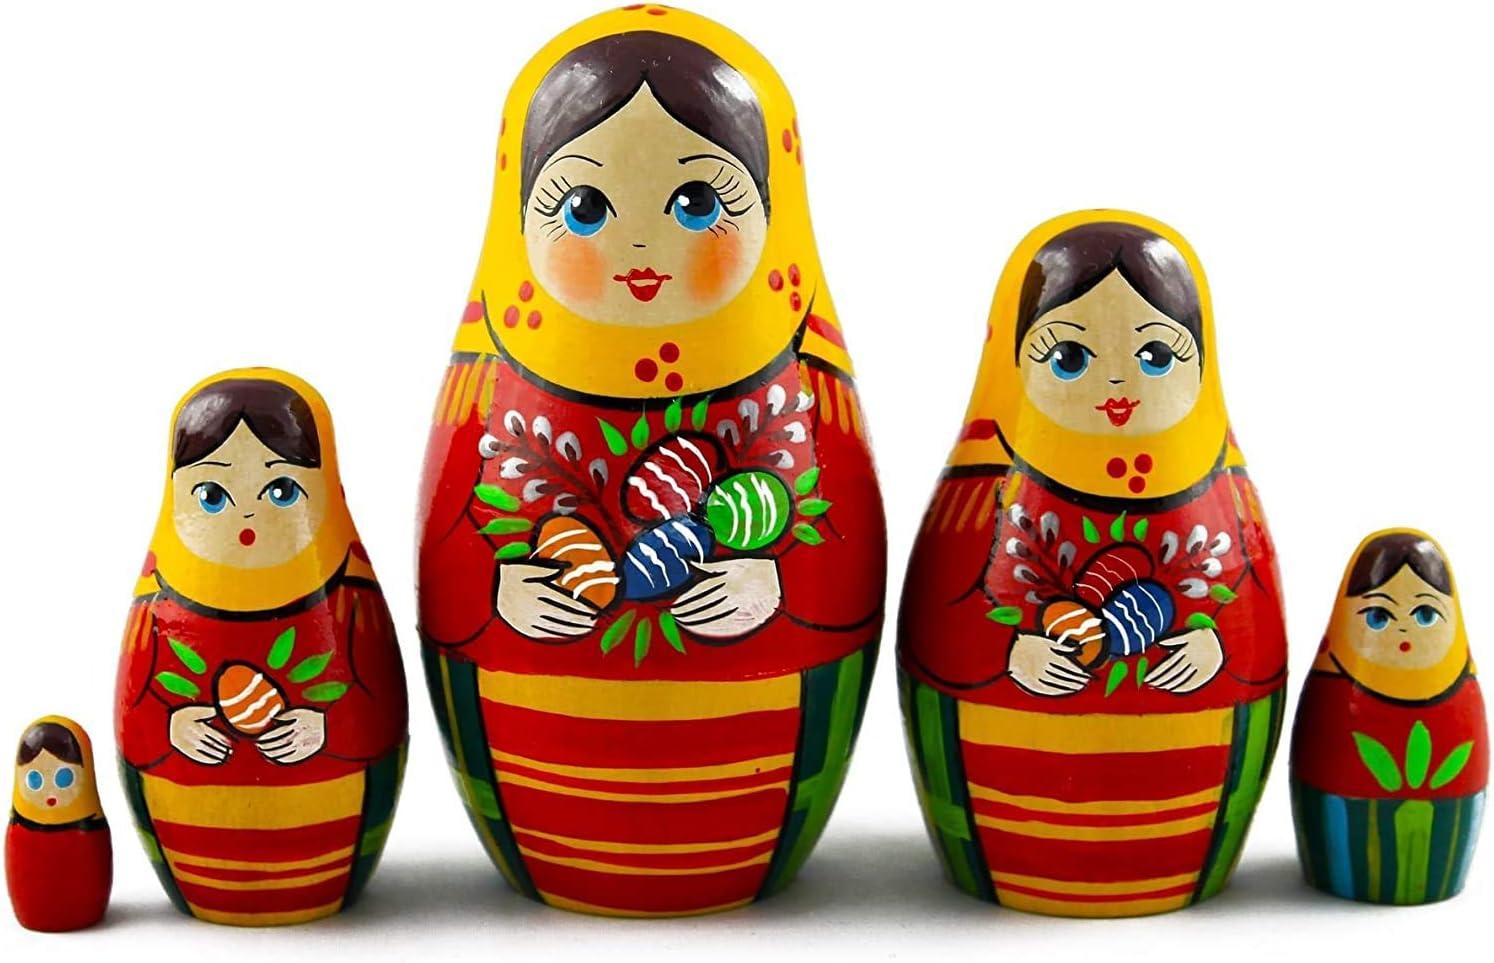 5pcs Handmade Painted Set Toys Creative Nesting Dolls Russian Wishing Doll